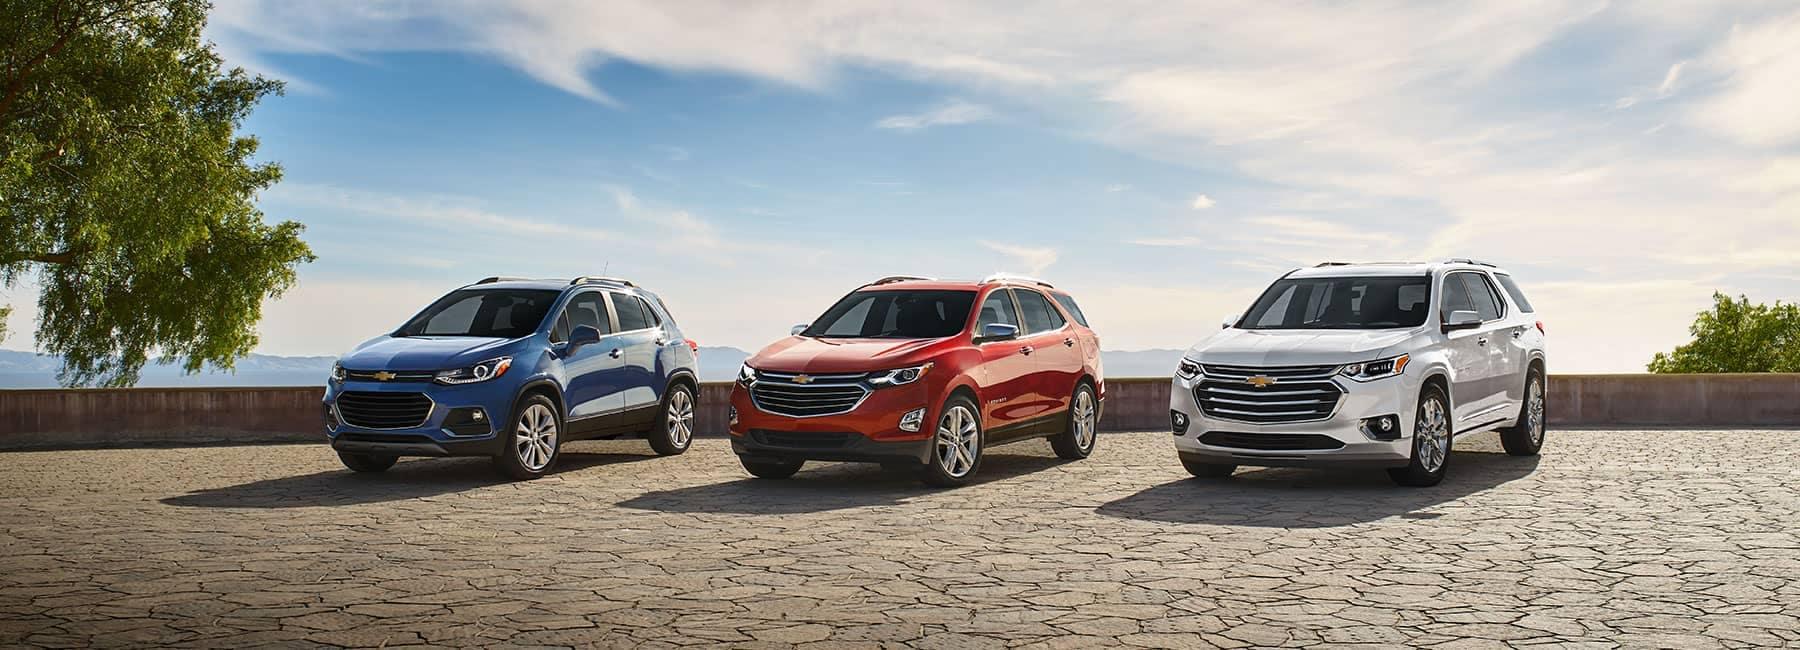 2019 Chevrolet SUVs Lineup